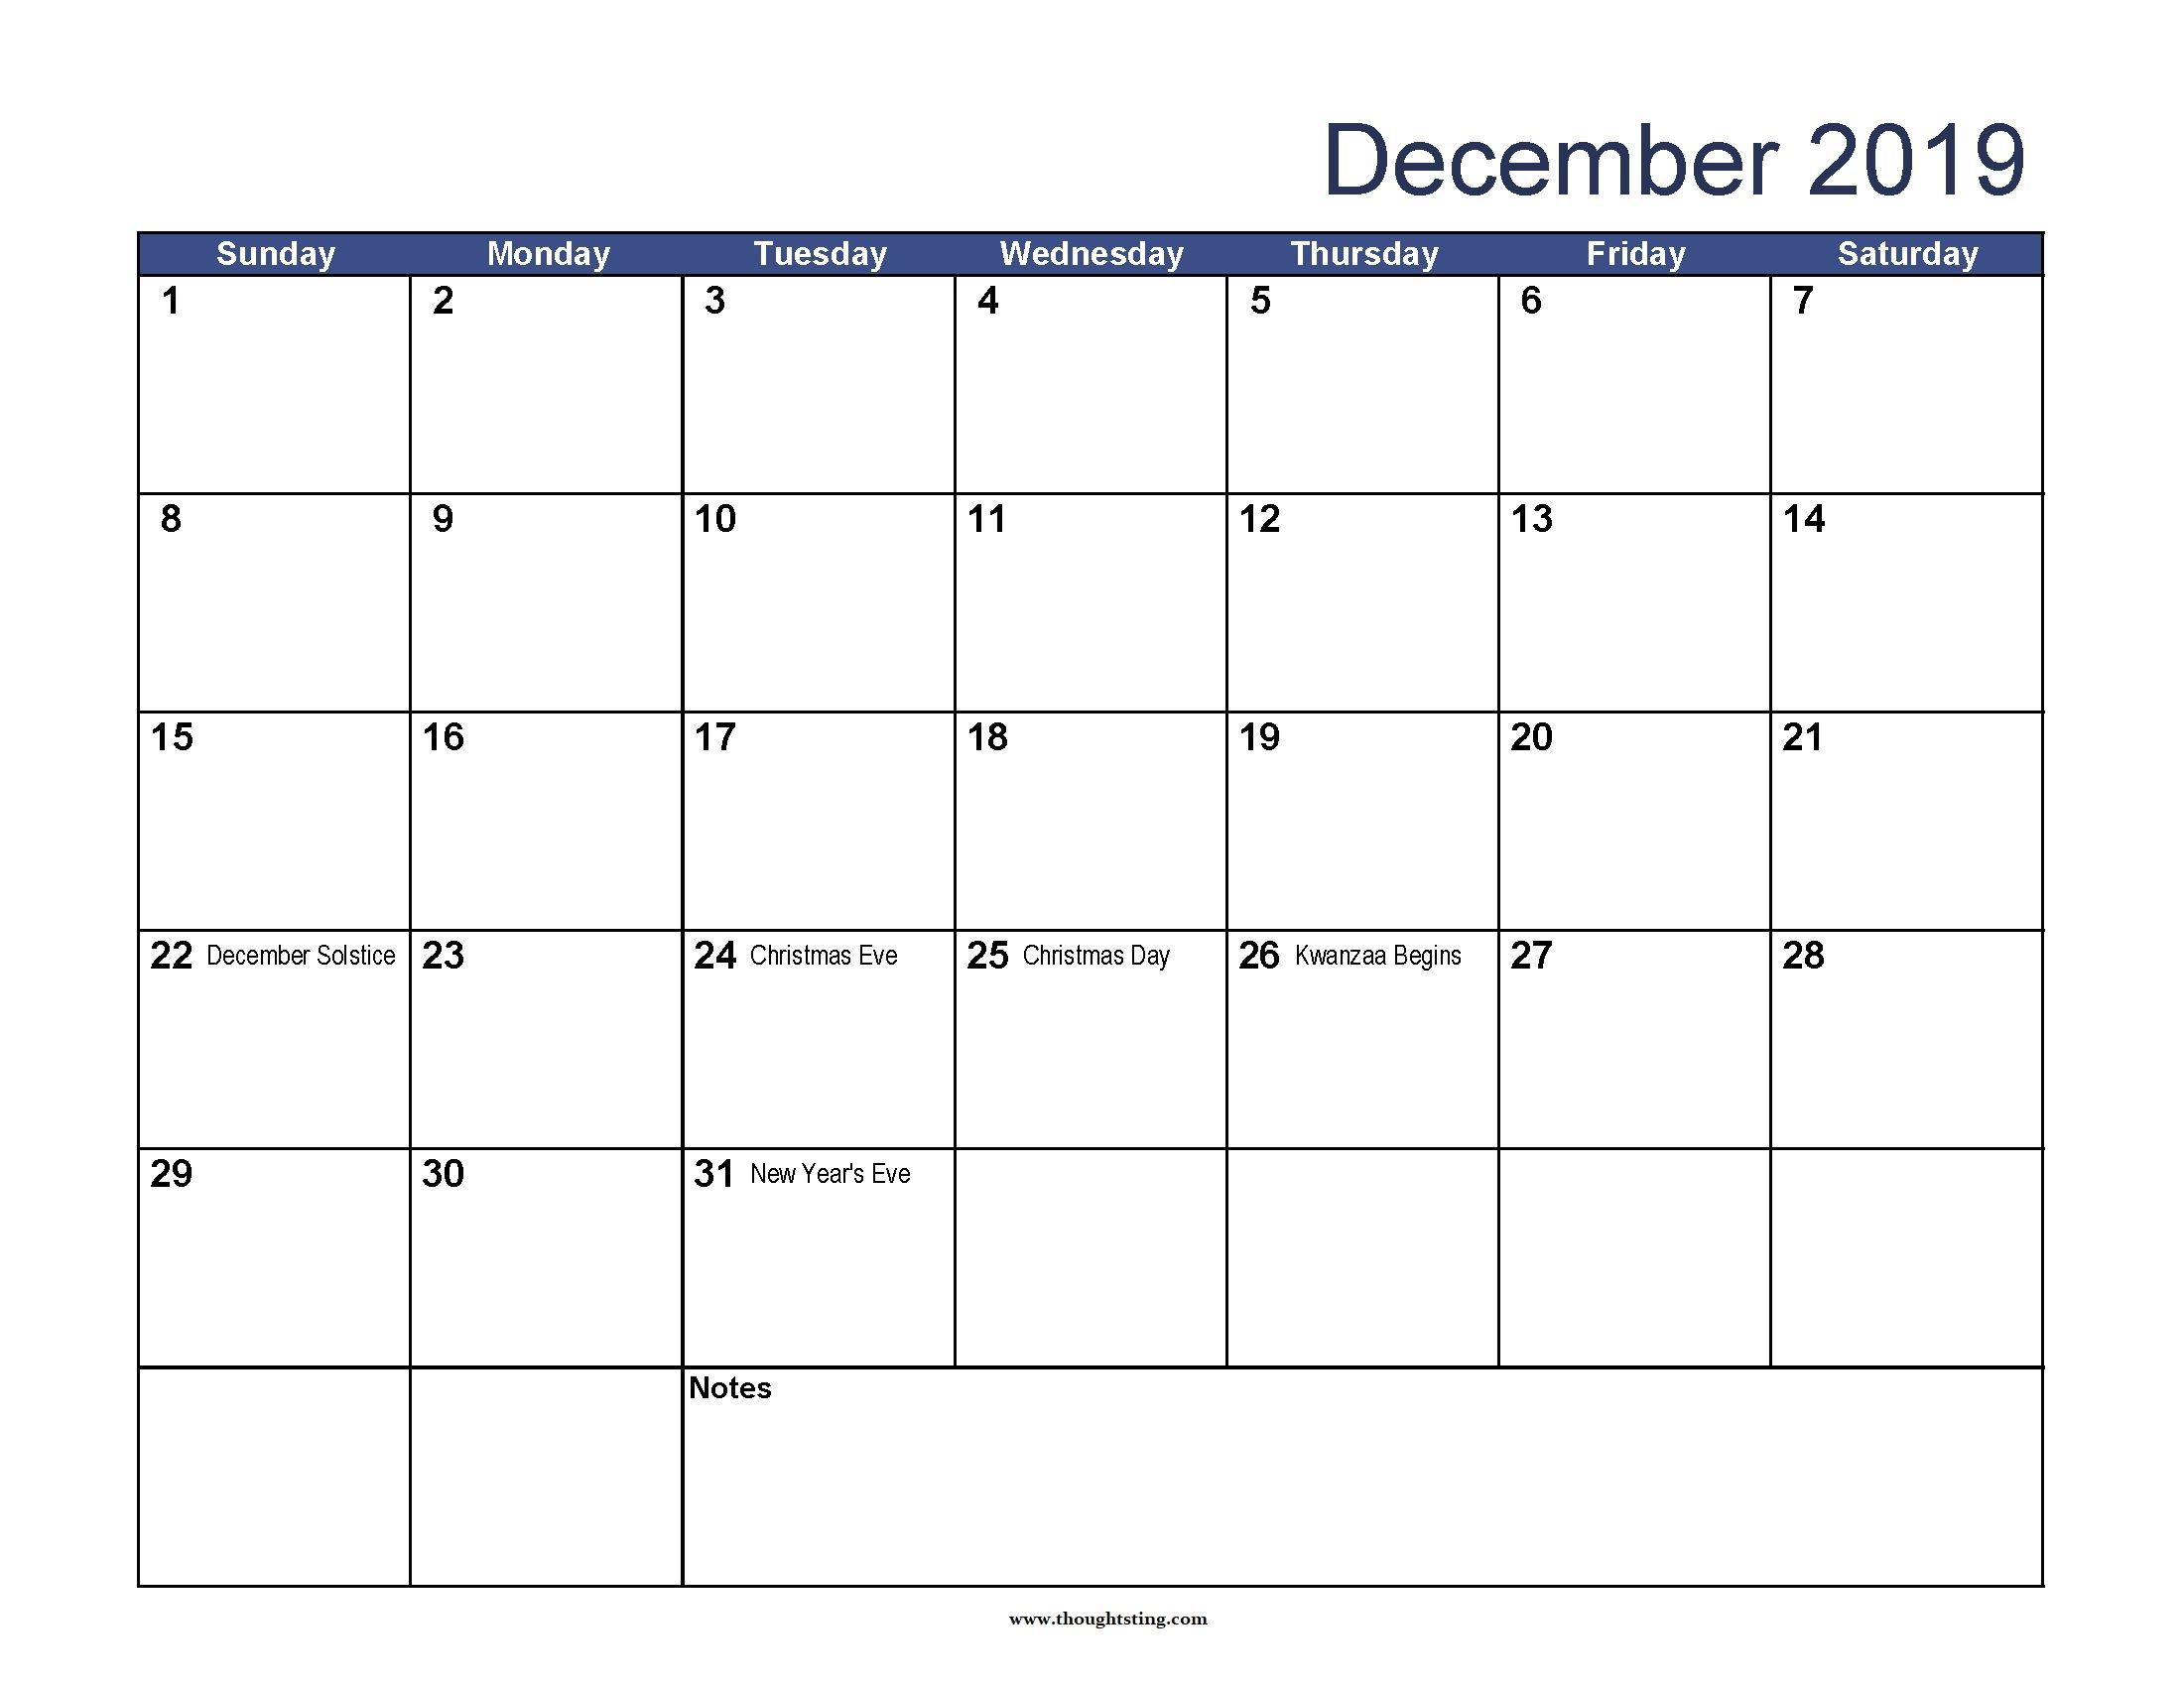 December 2019 Calendar With Holidays Usa, Australia, Uk